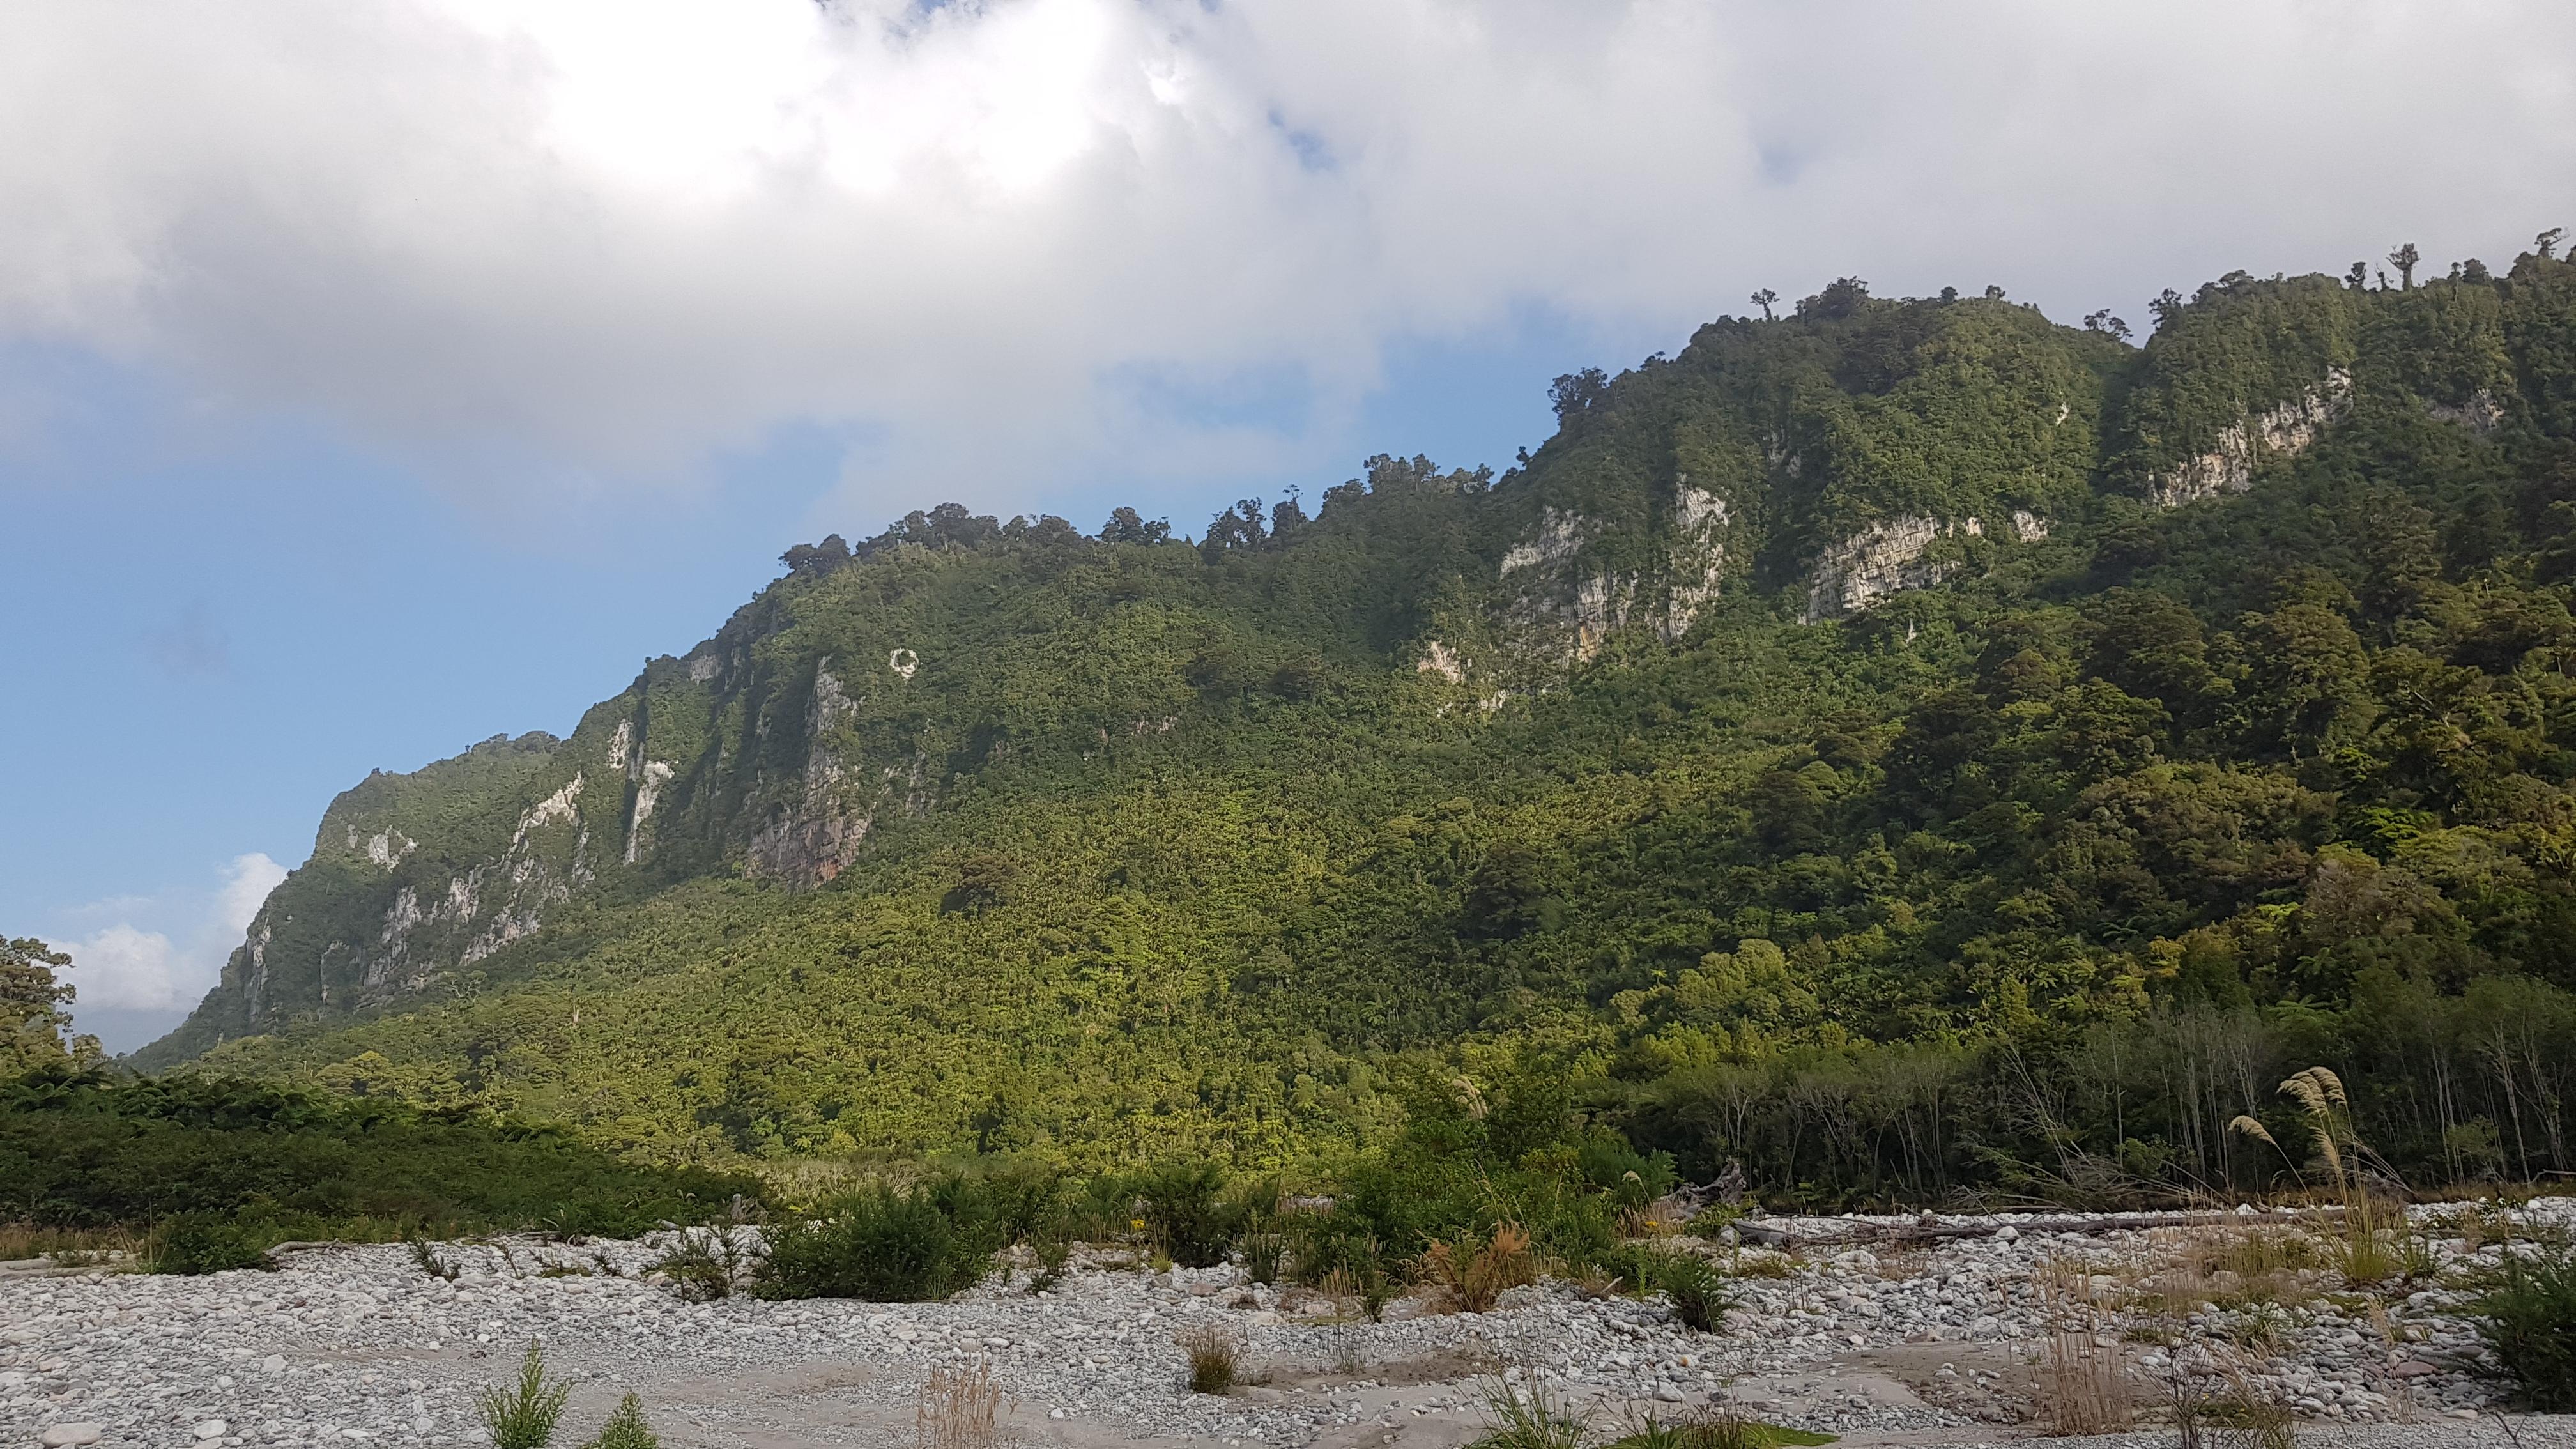 The cliffs along the Fox River